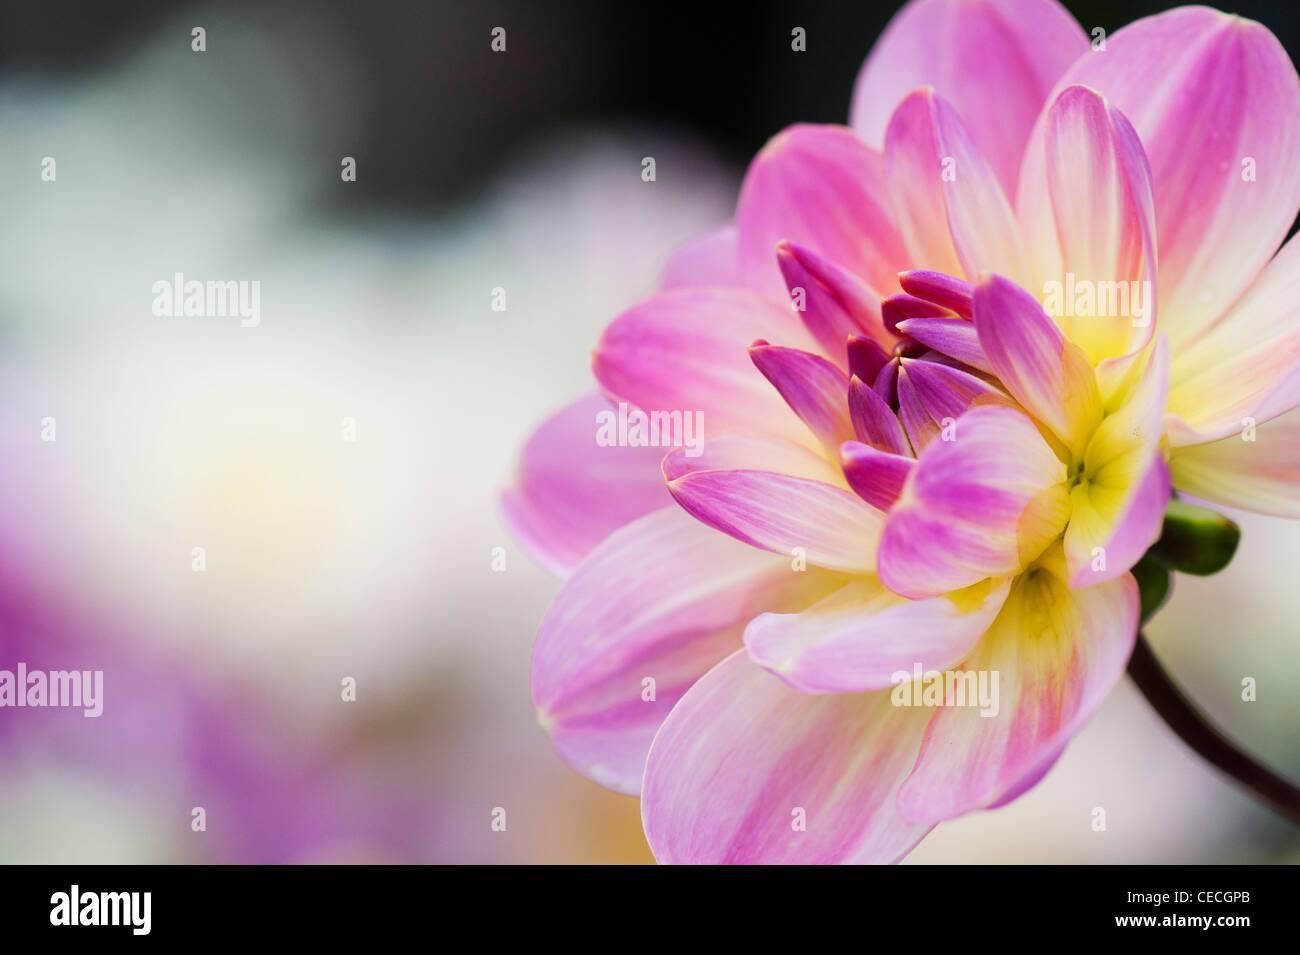 Dahlia 'Oriental Dream' fleur. Dahlia nénuphar. Photo Stock